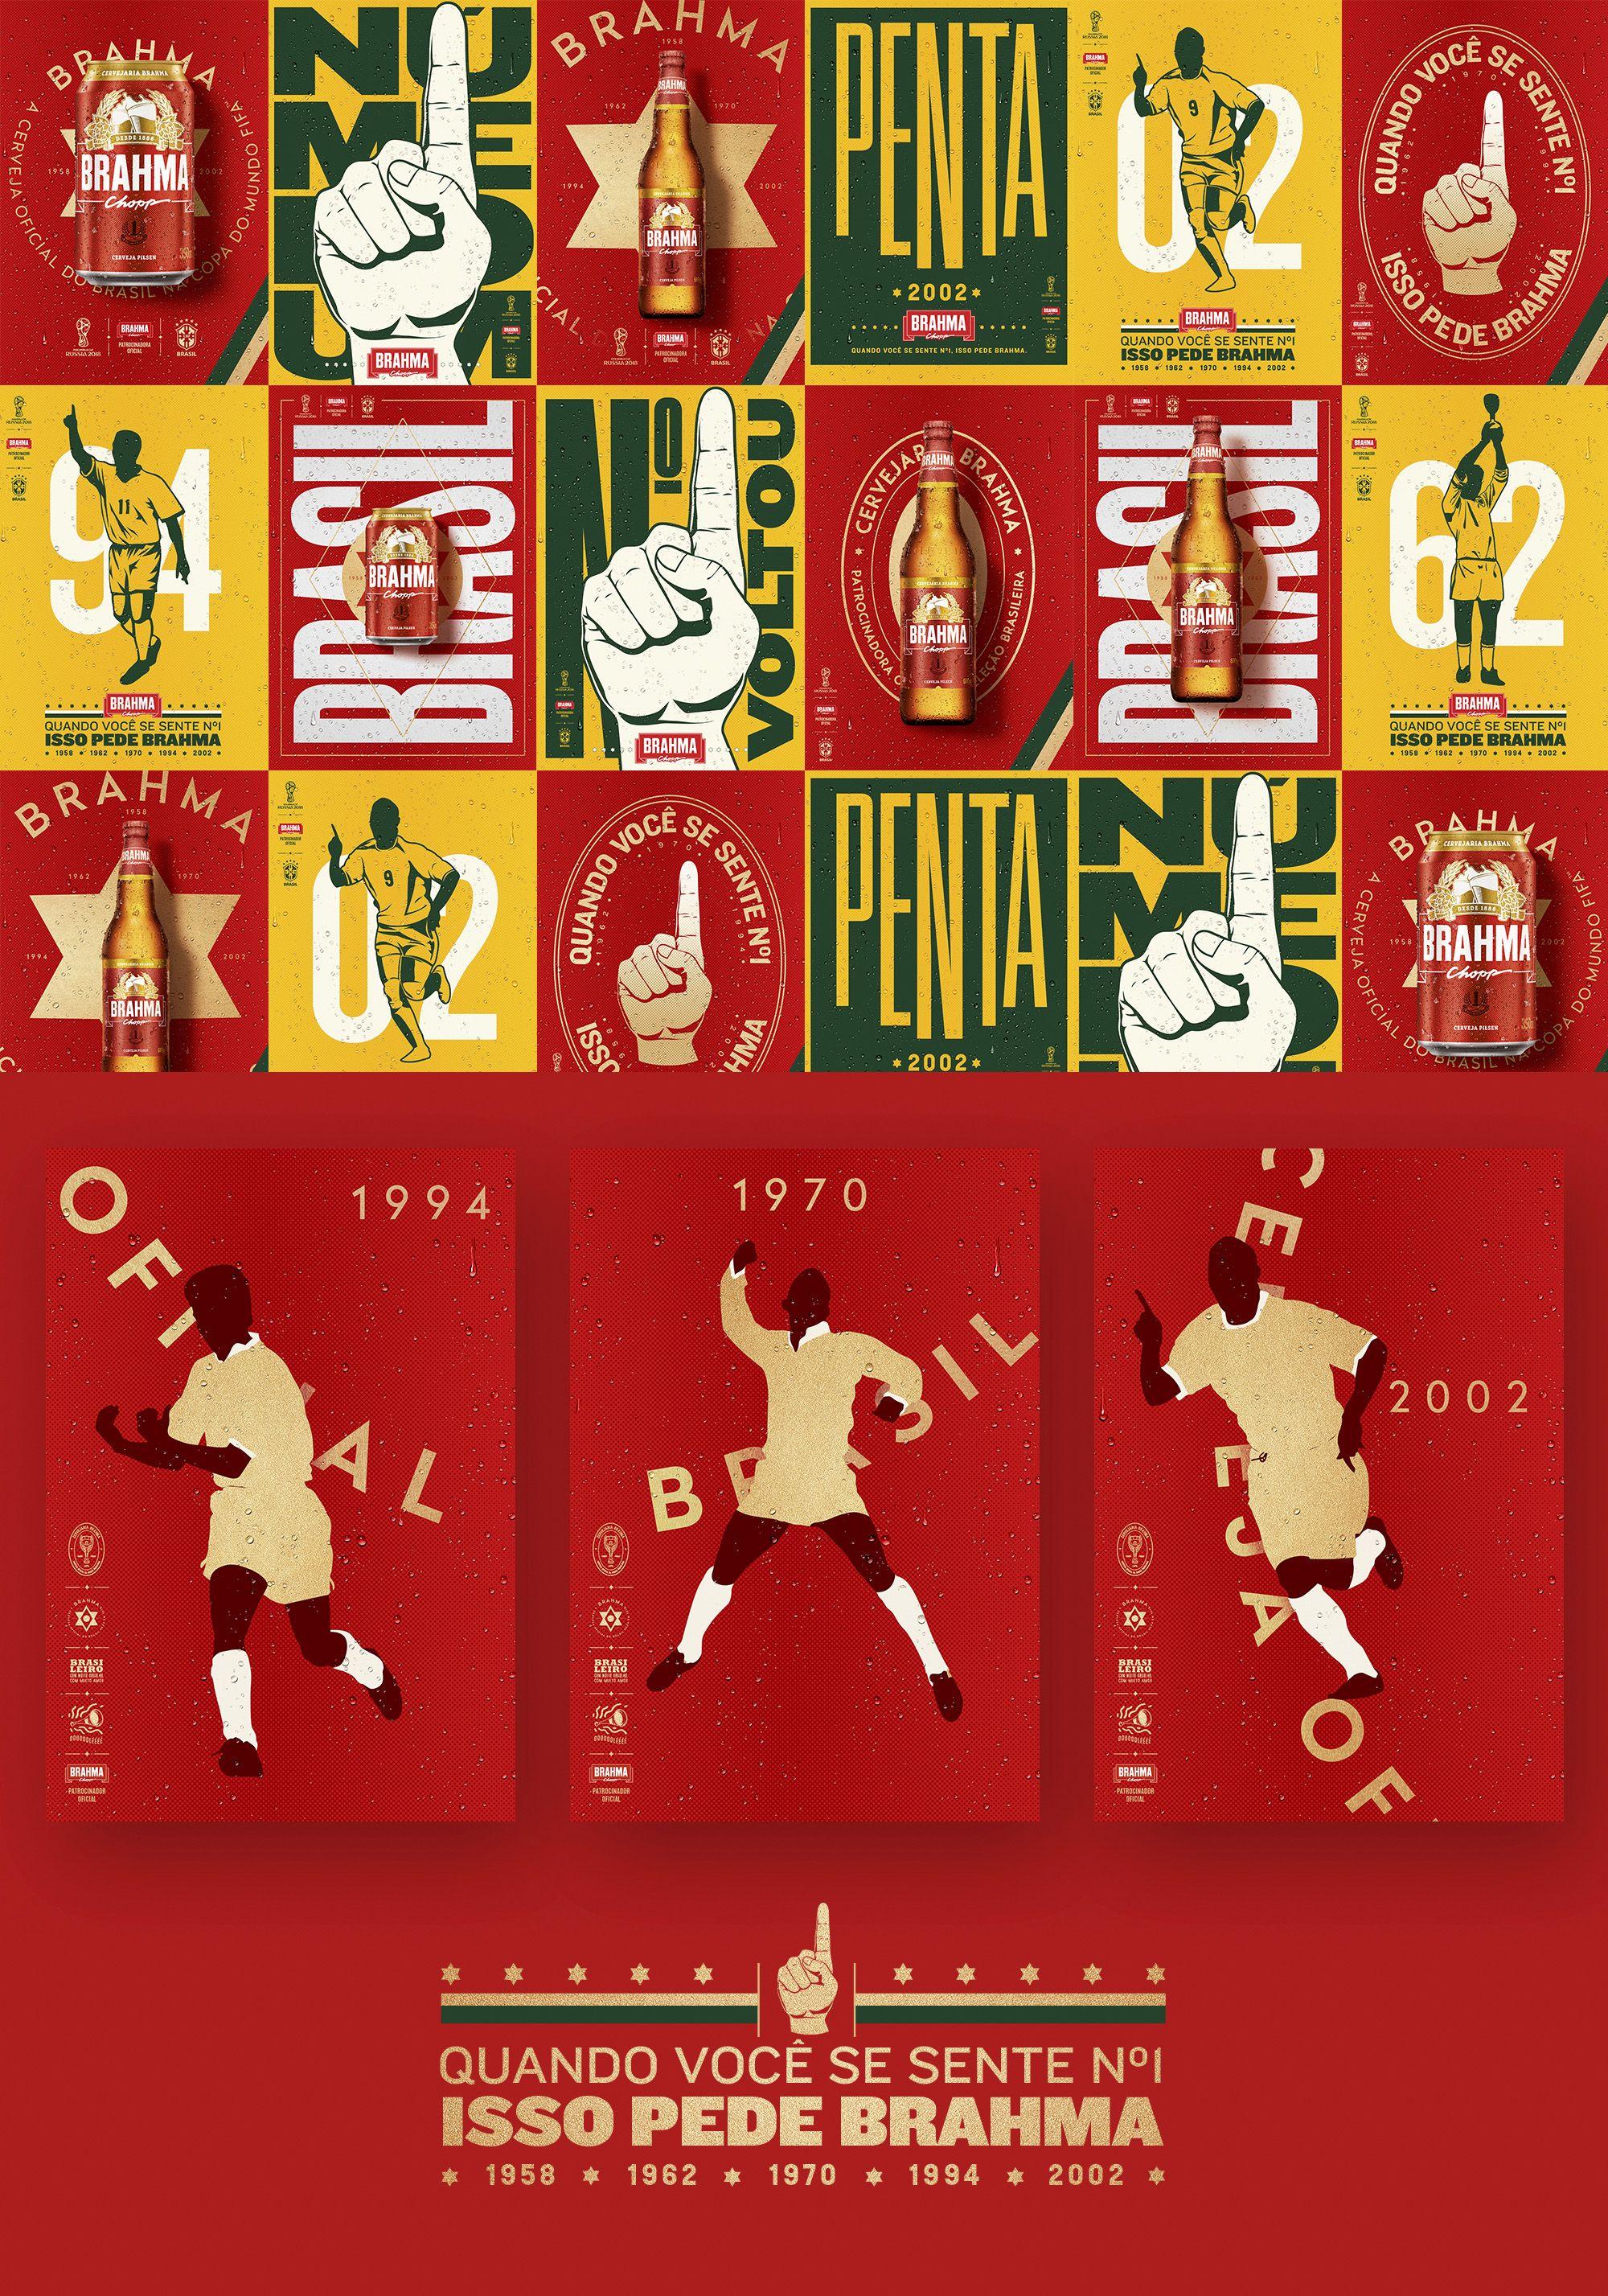 Maso Heck Art Director Brewery Brahma World Cup 2018 In 2020 Graphic Design Brochure Poster Design Bold Art